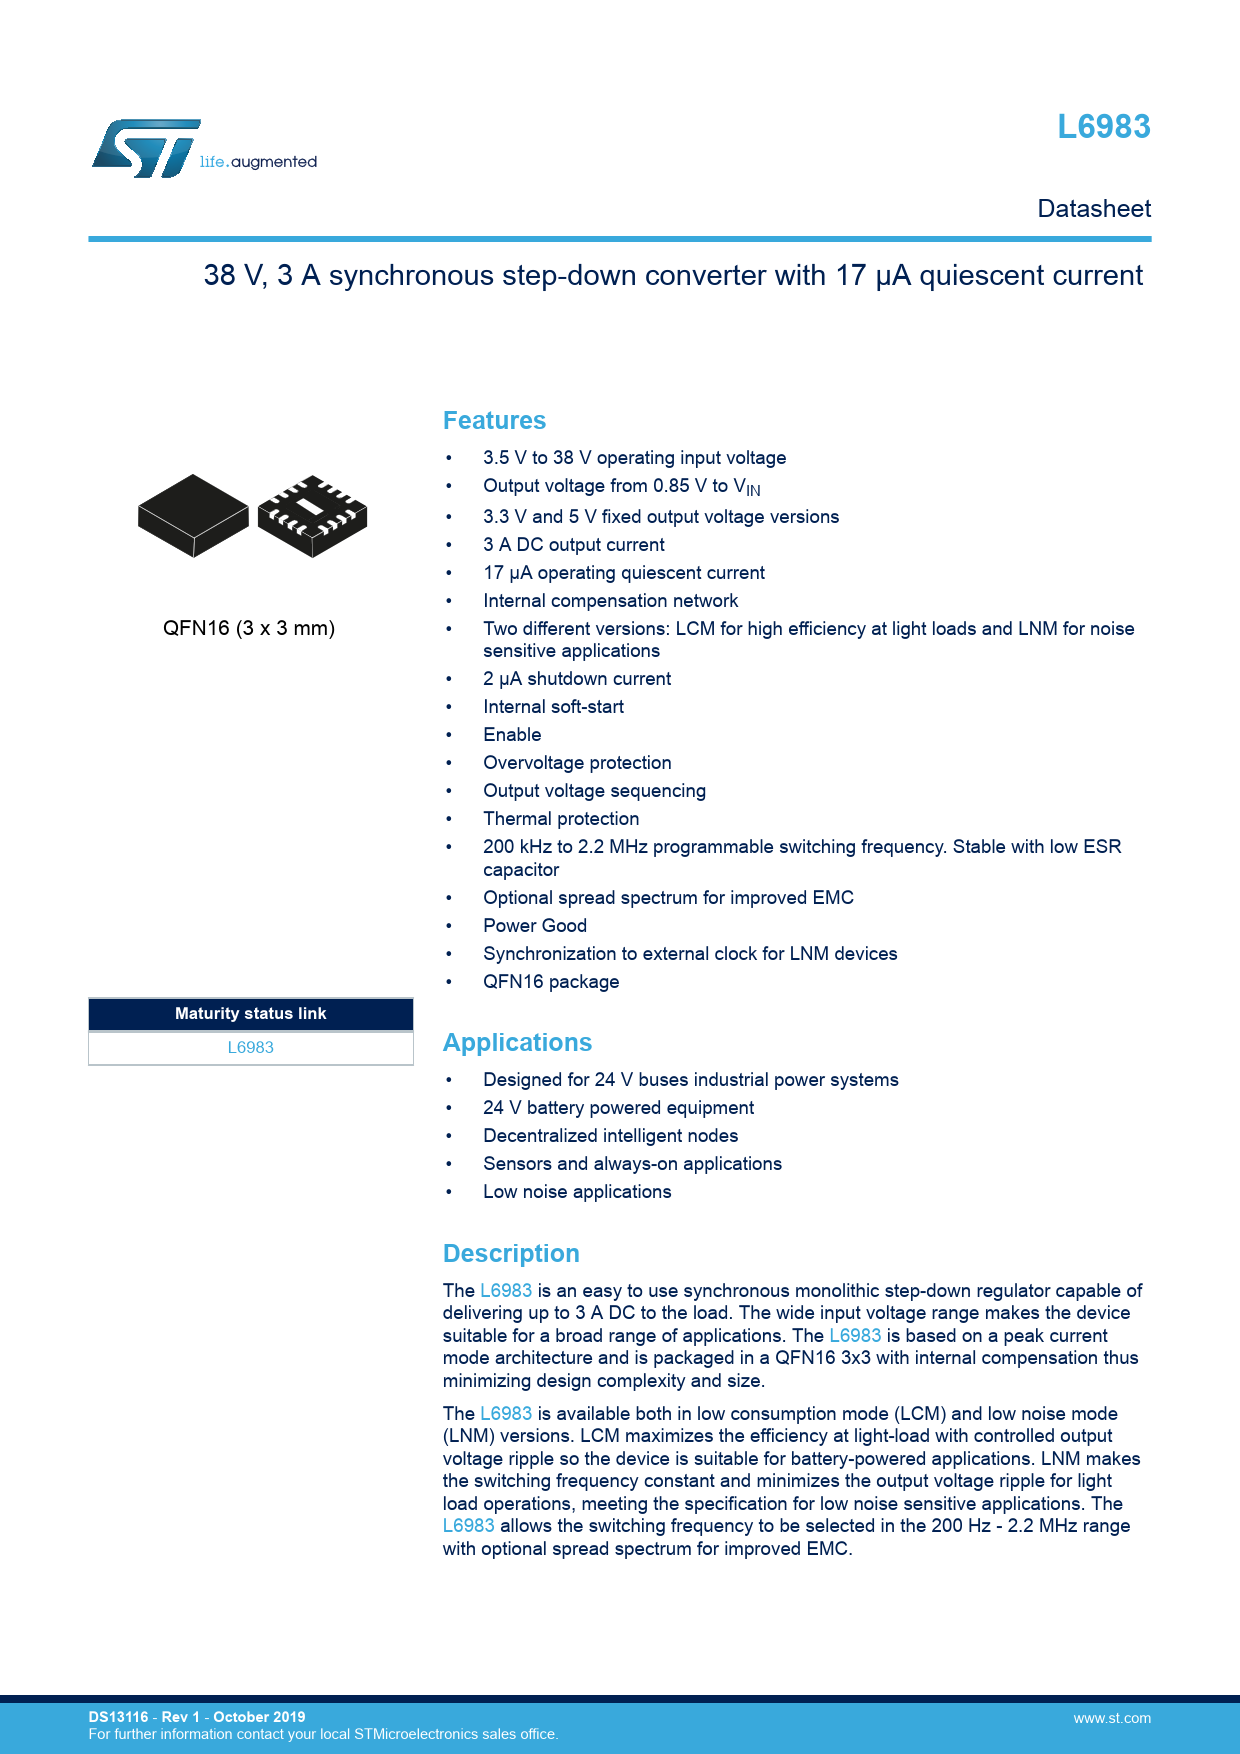 Datasheet L6983 STMicroelectronics